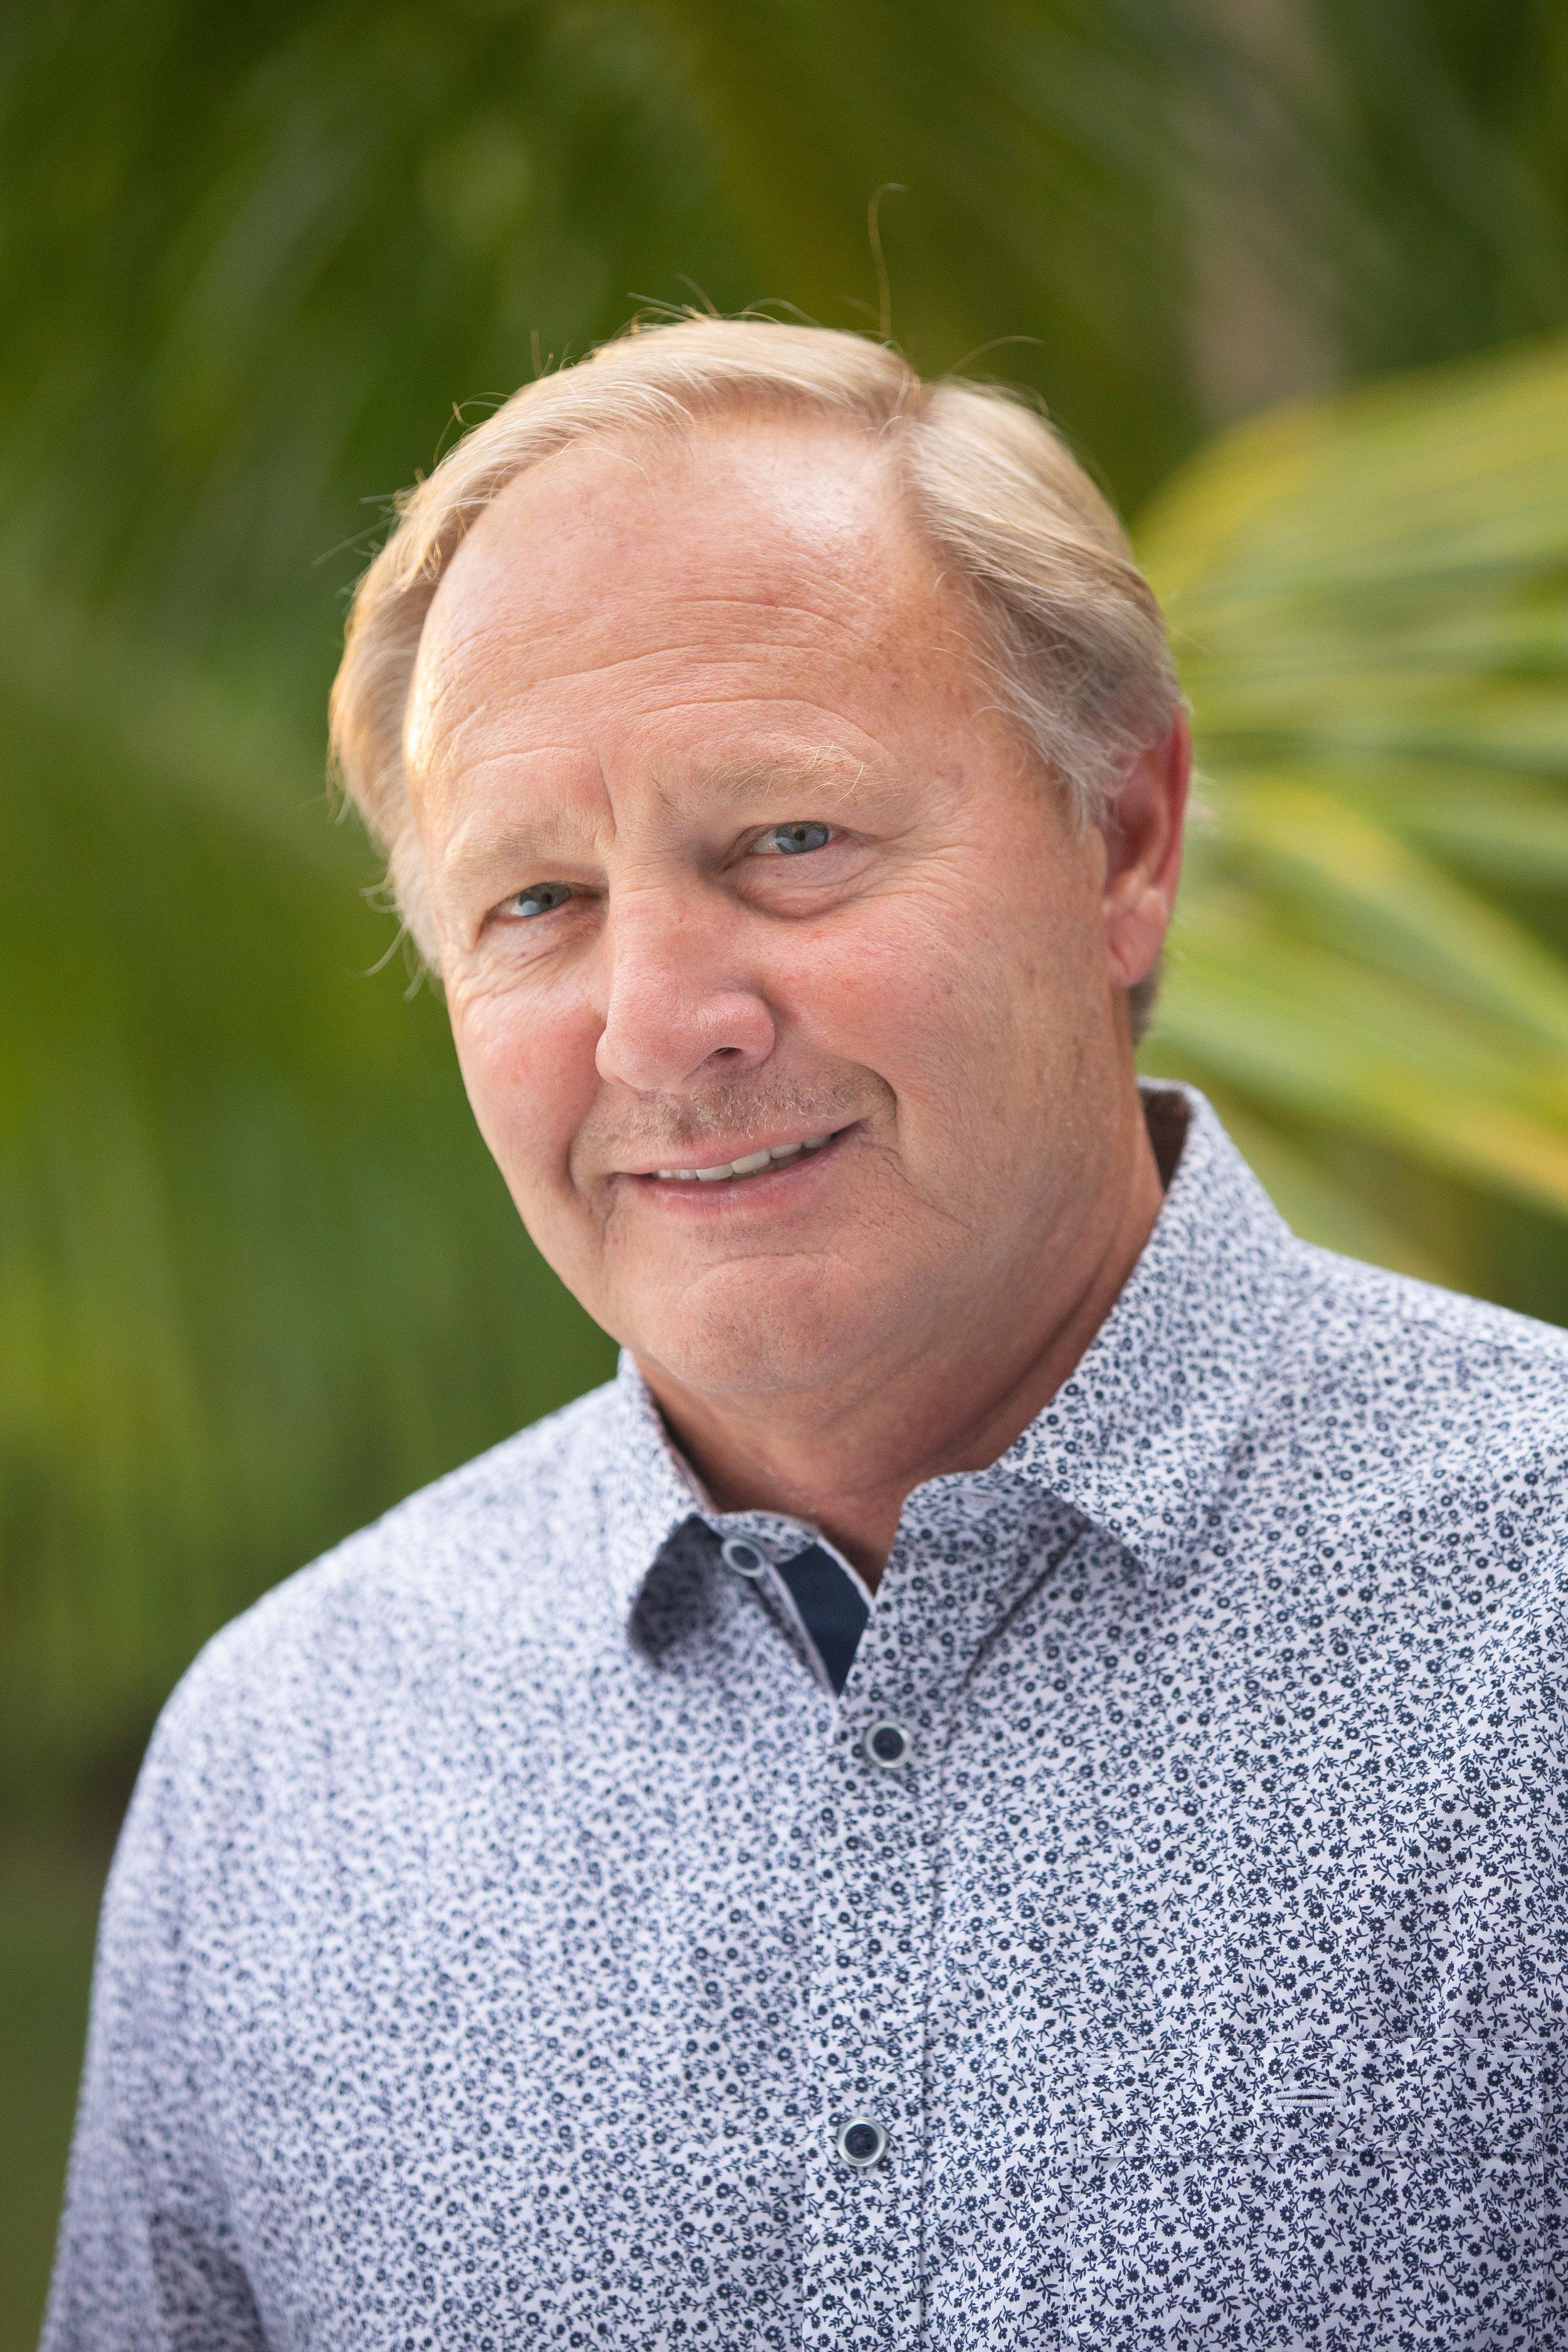 Billy Vaughn, Jr. - Vice President